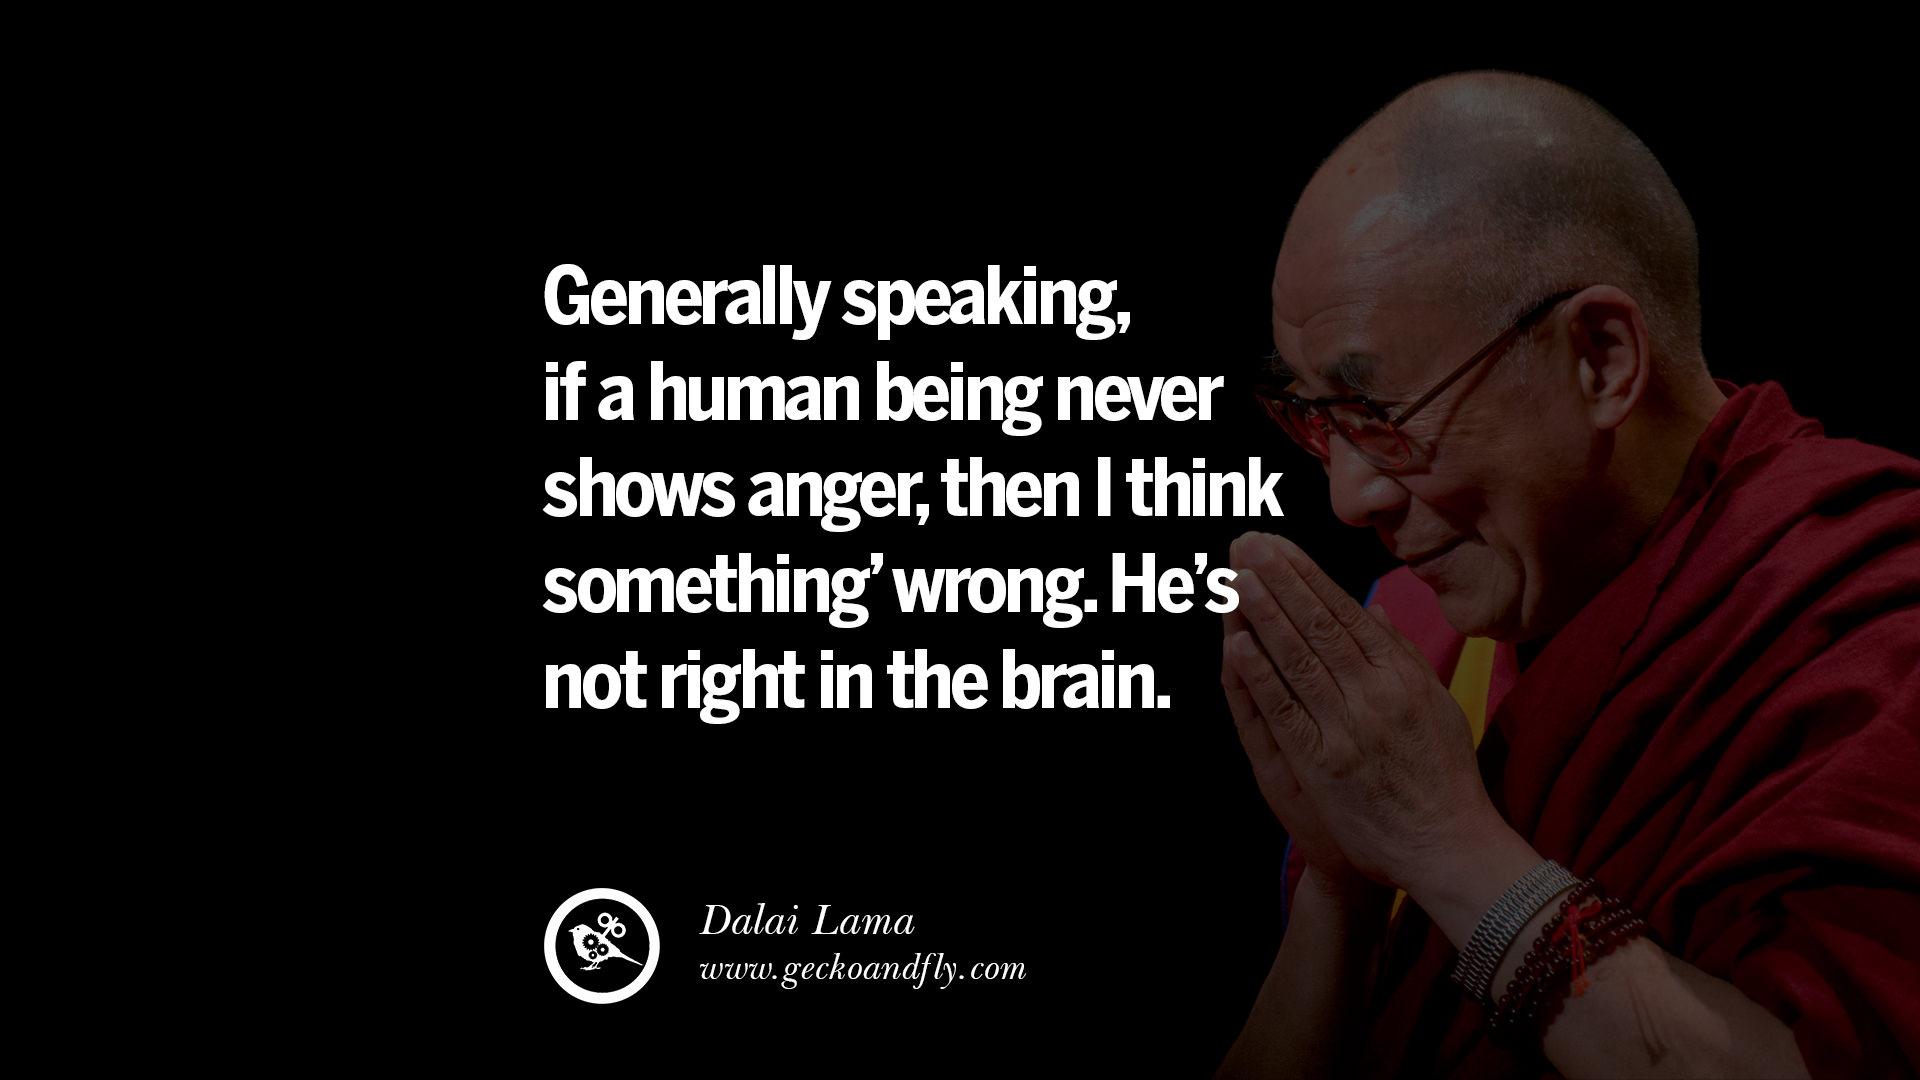 https://i2.wp.com/cdn2.geckoandfly.com/wp-content/uploads/2014/03/dalai-lama10.jpg